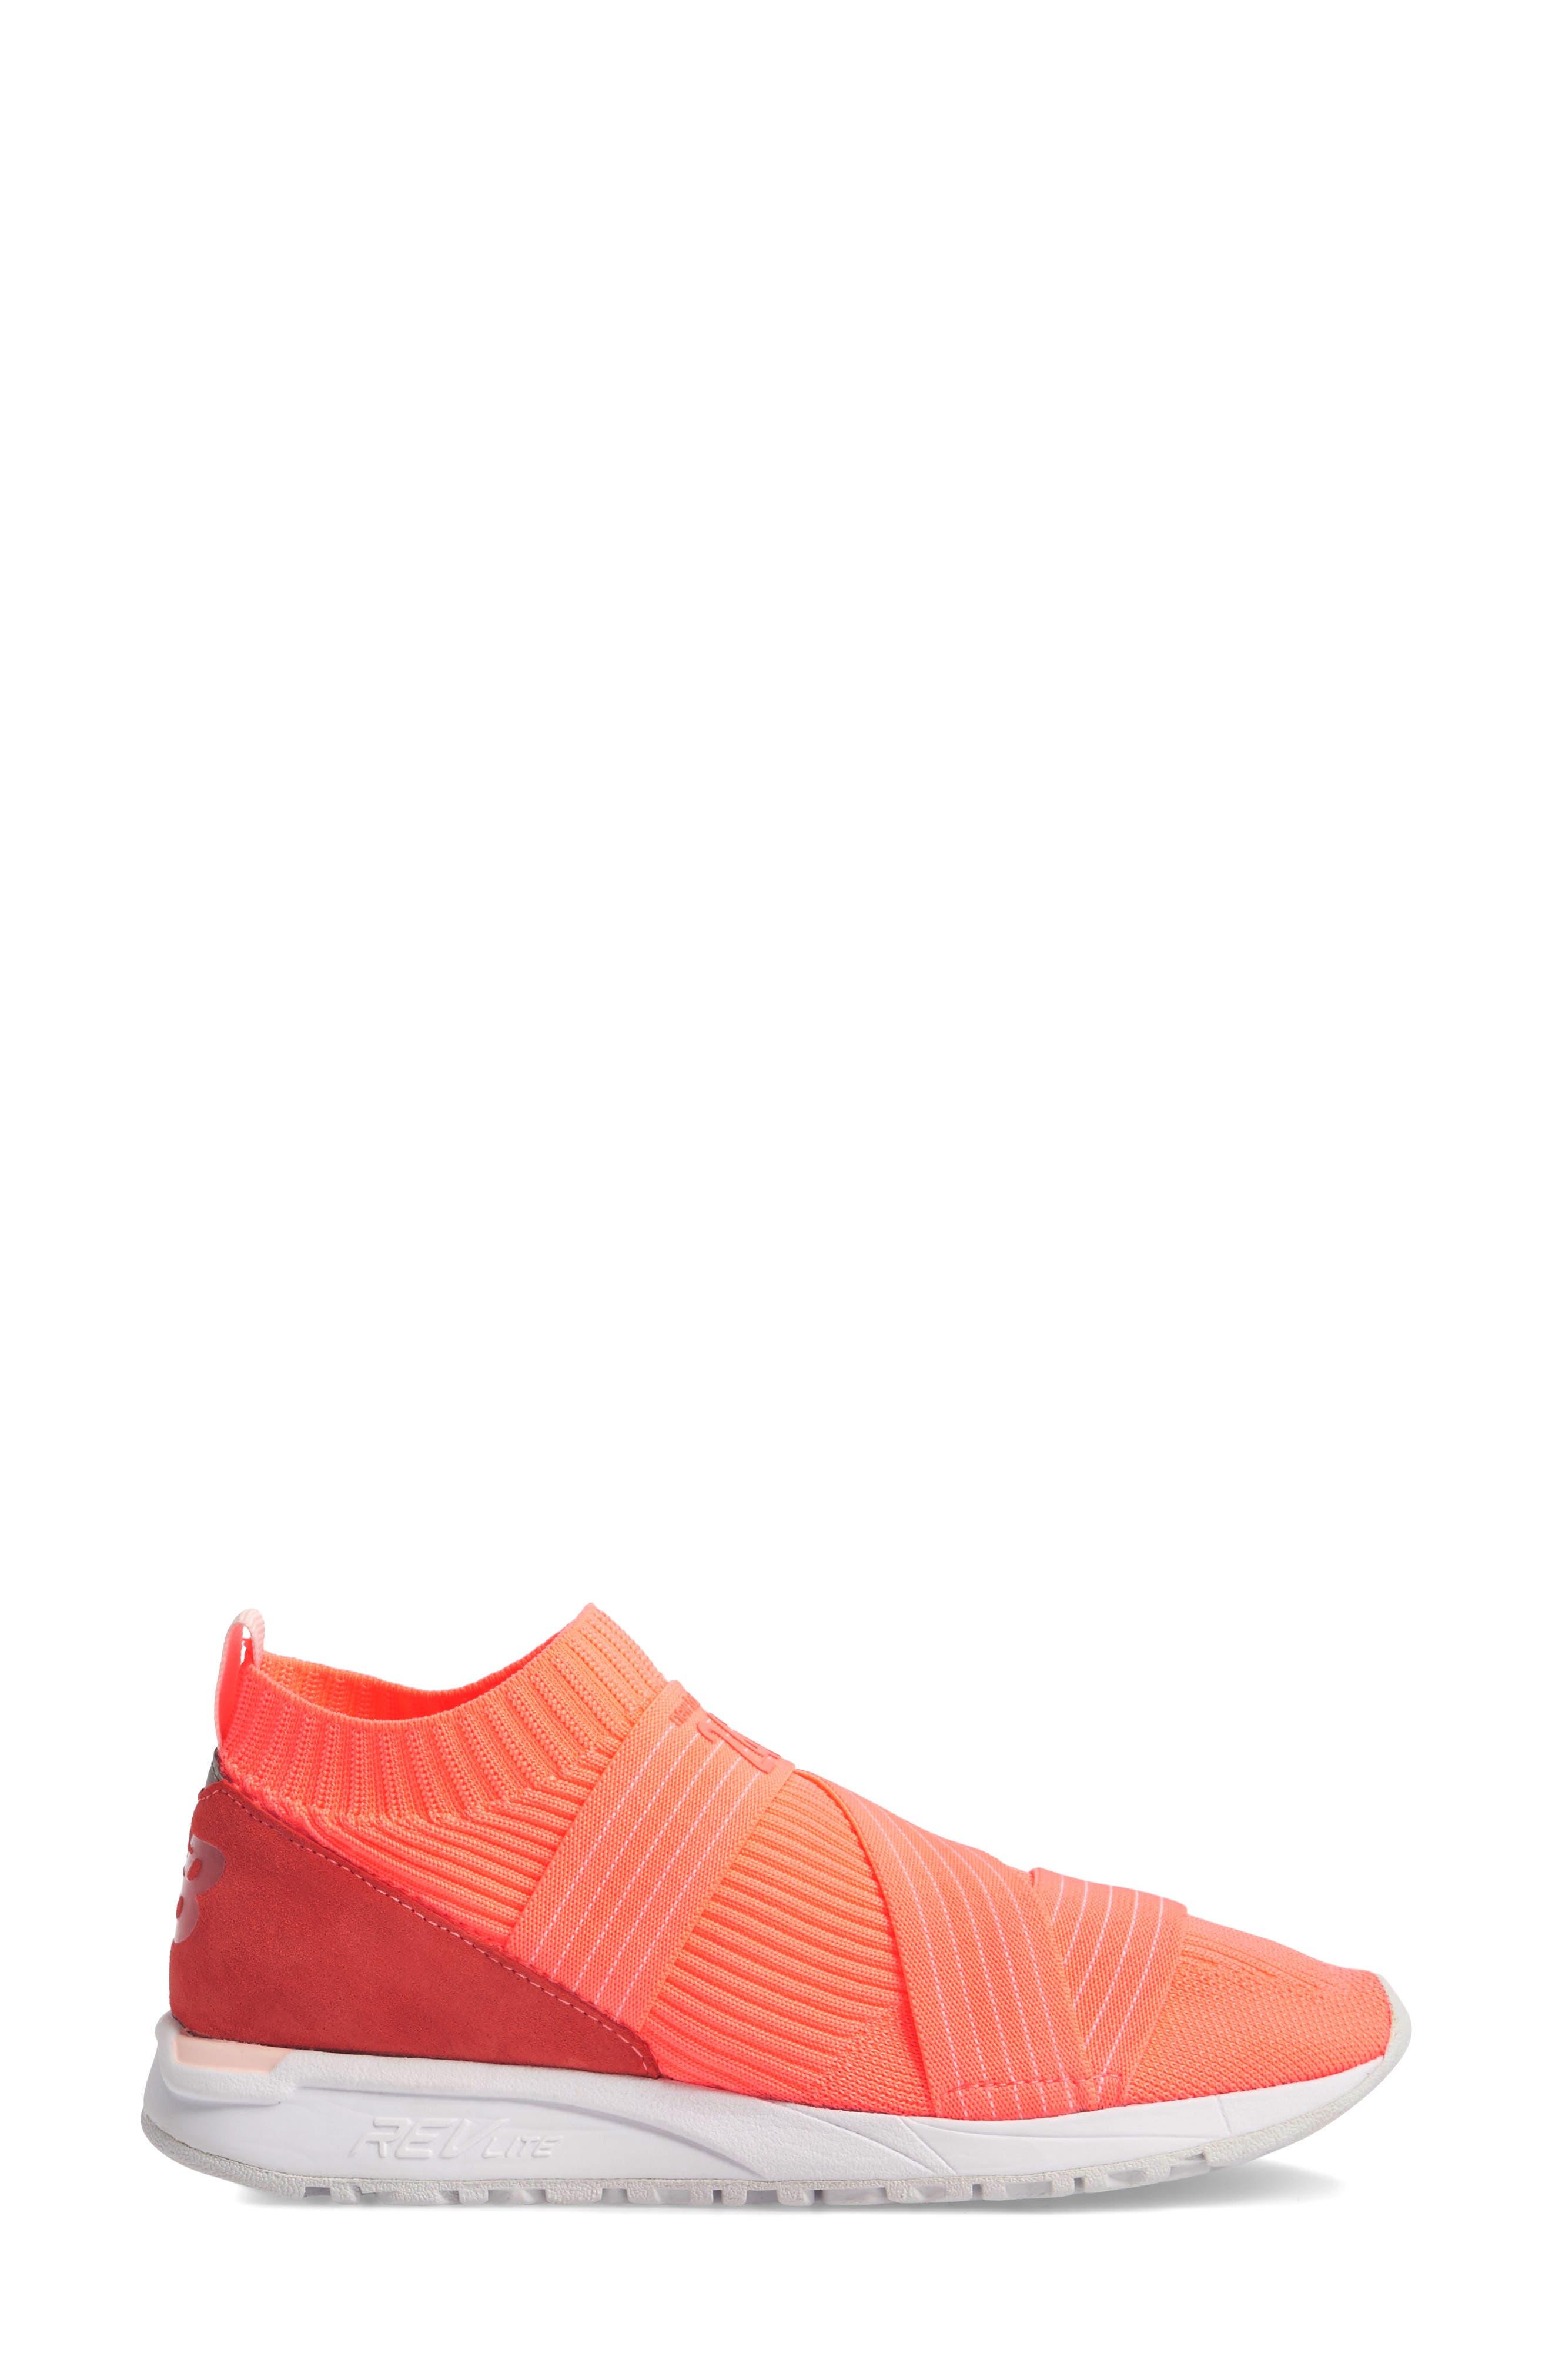 247 Knit Sneaker,                             Alternate thumbnail 6, color,